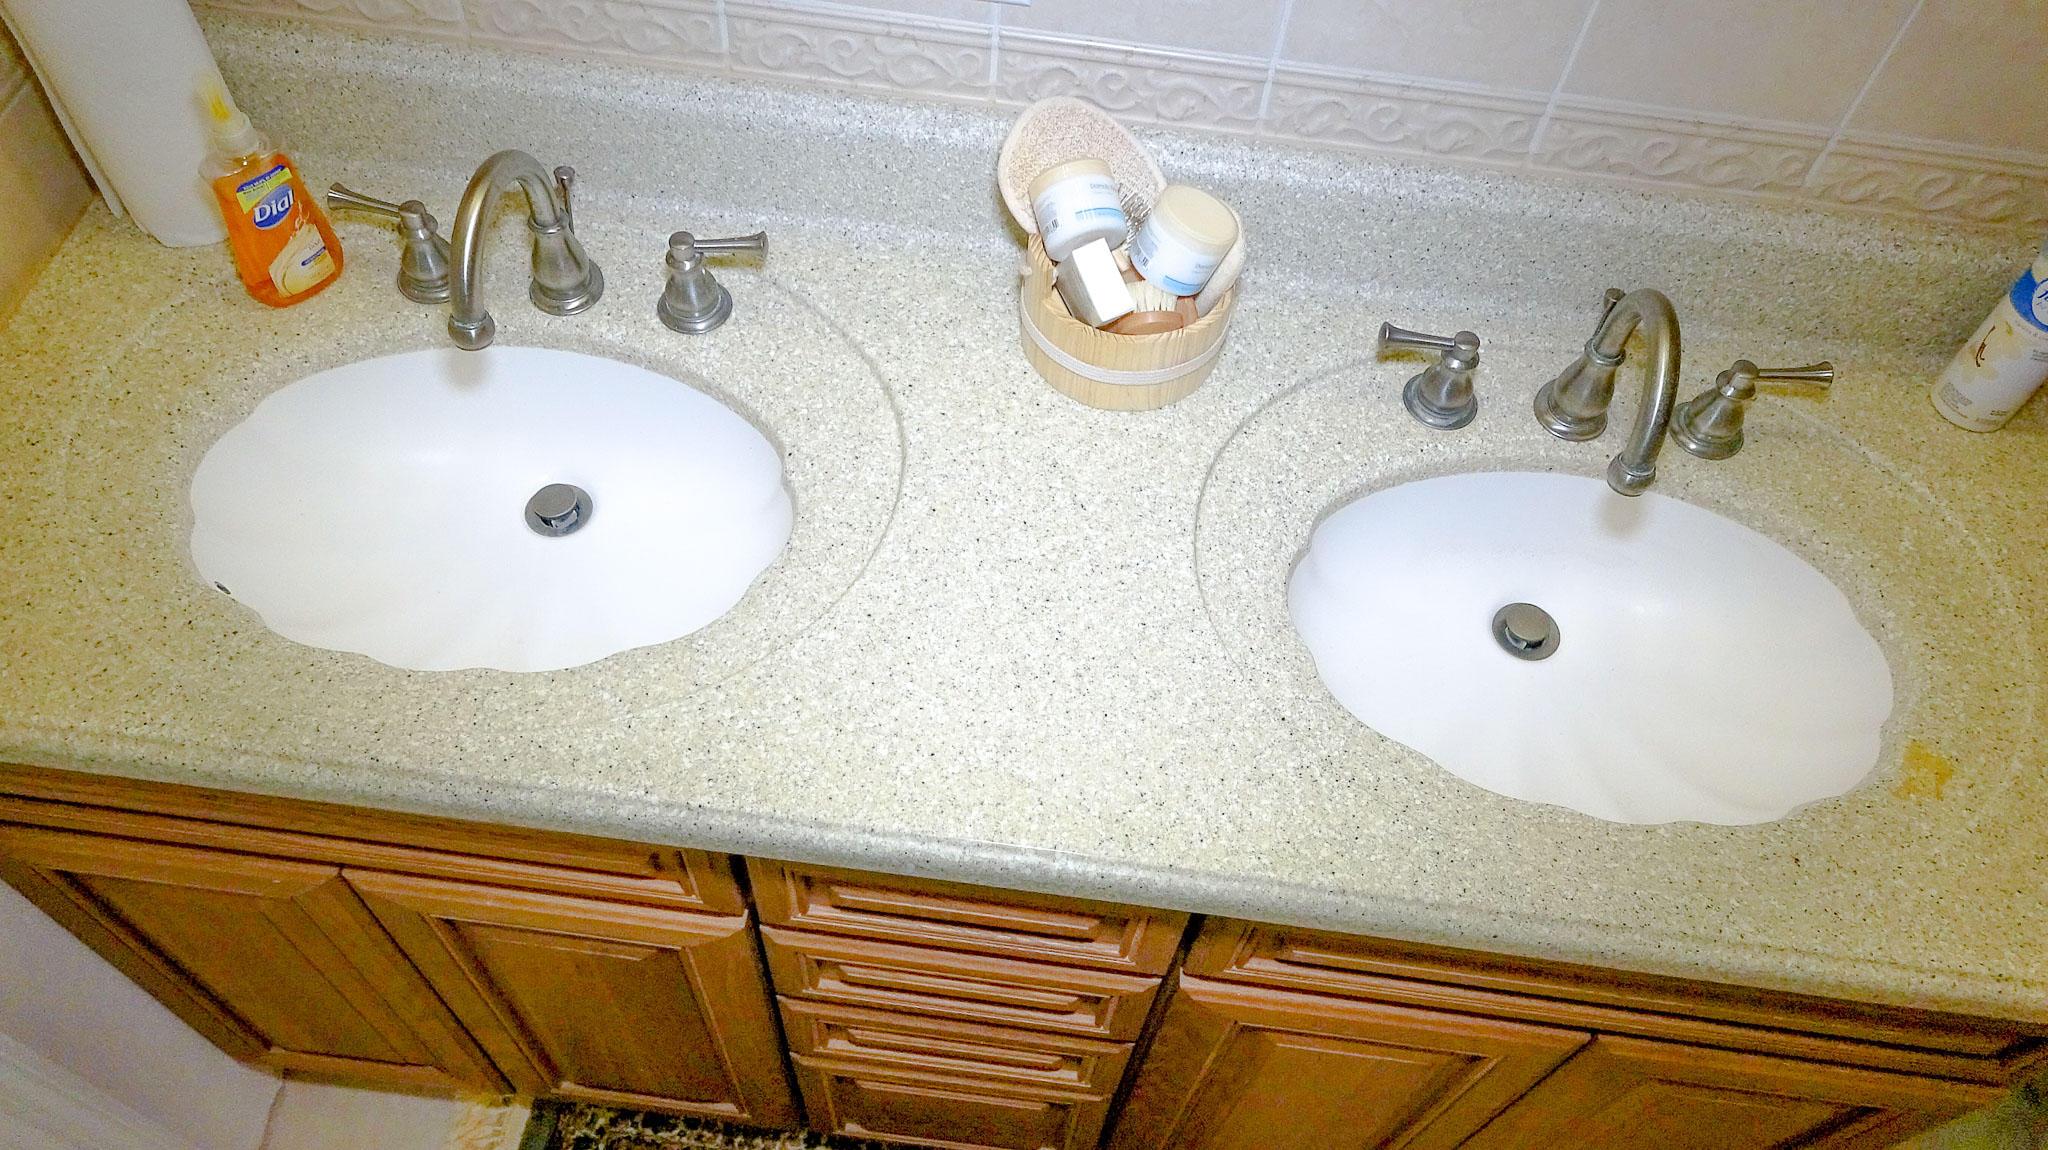 25 New Bathroom pic